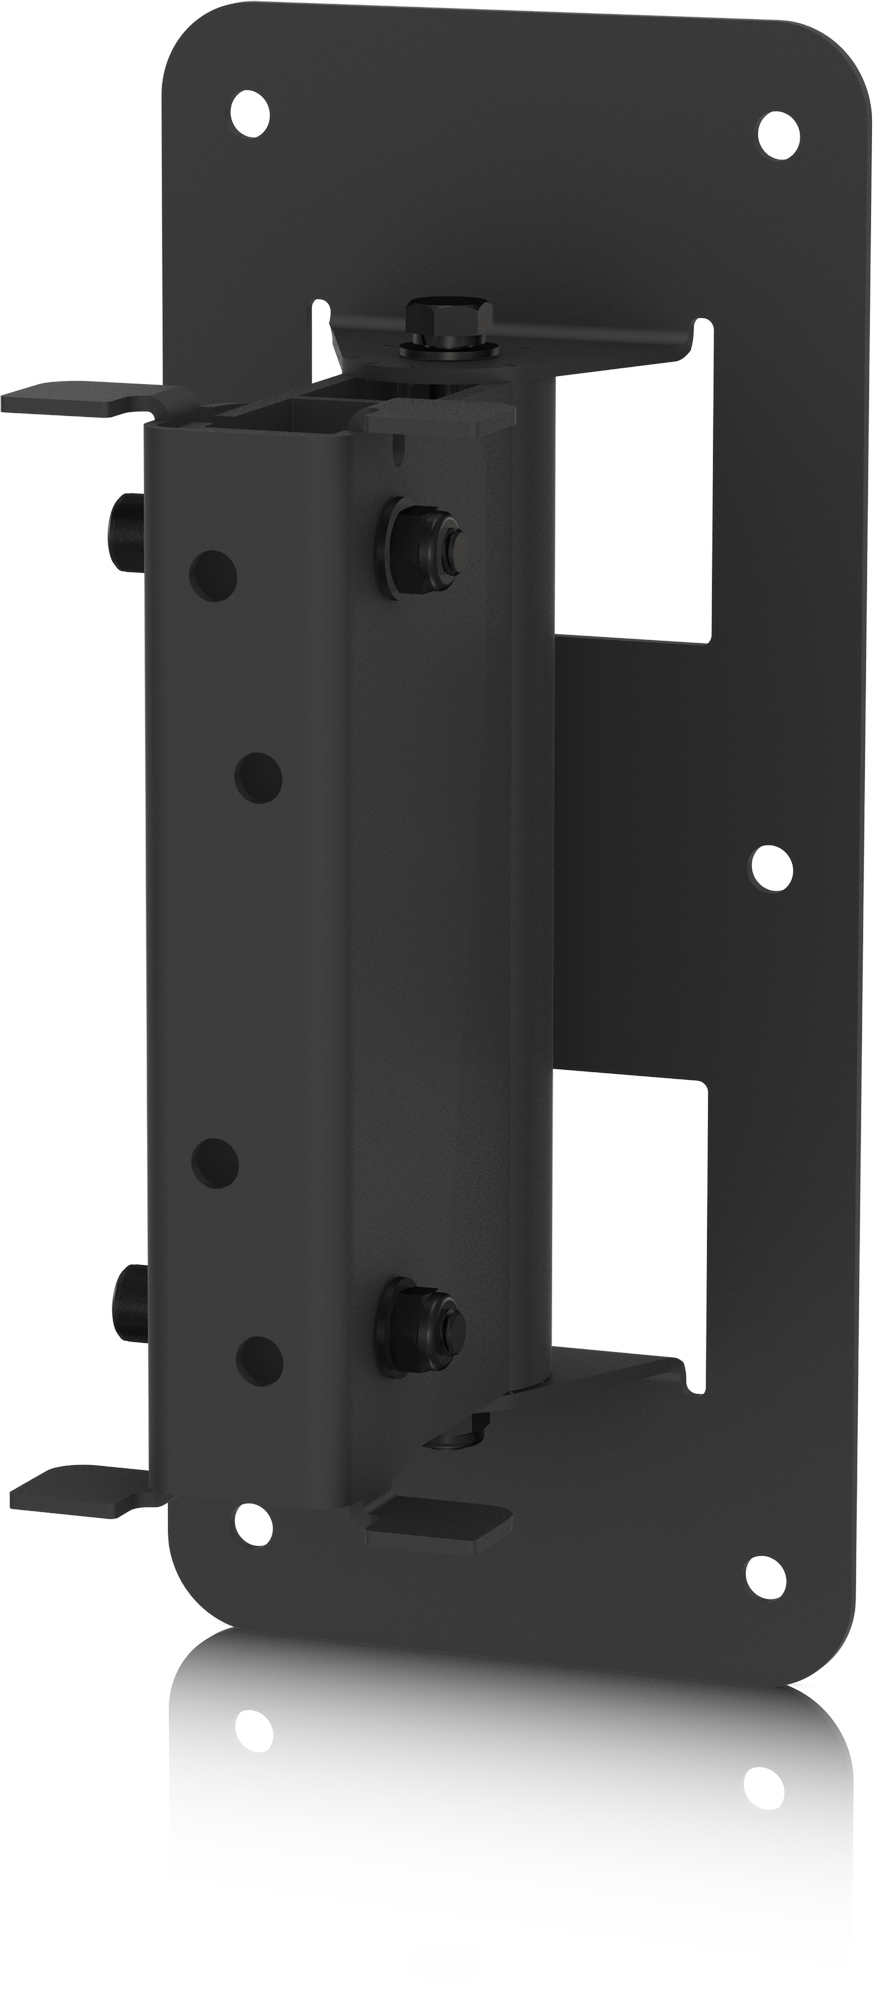 Tannoy 980017230 speaker mount Wall Steel Black